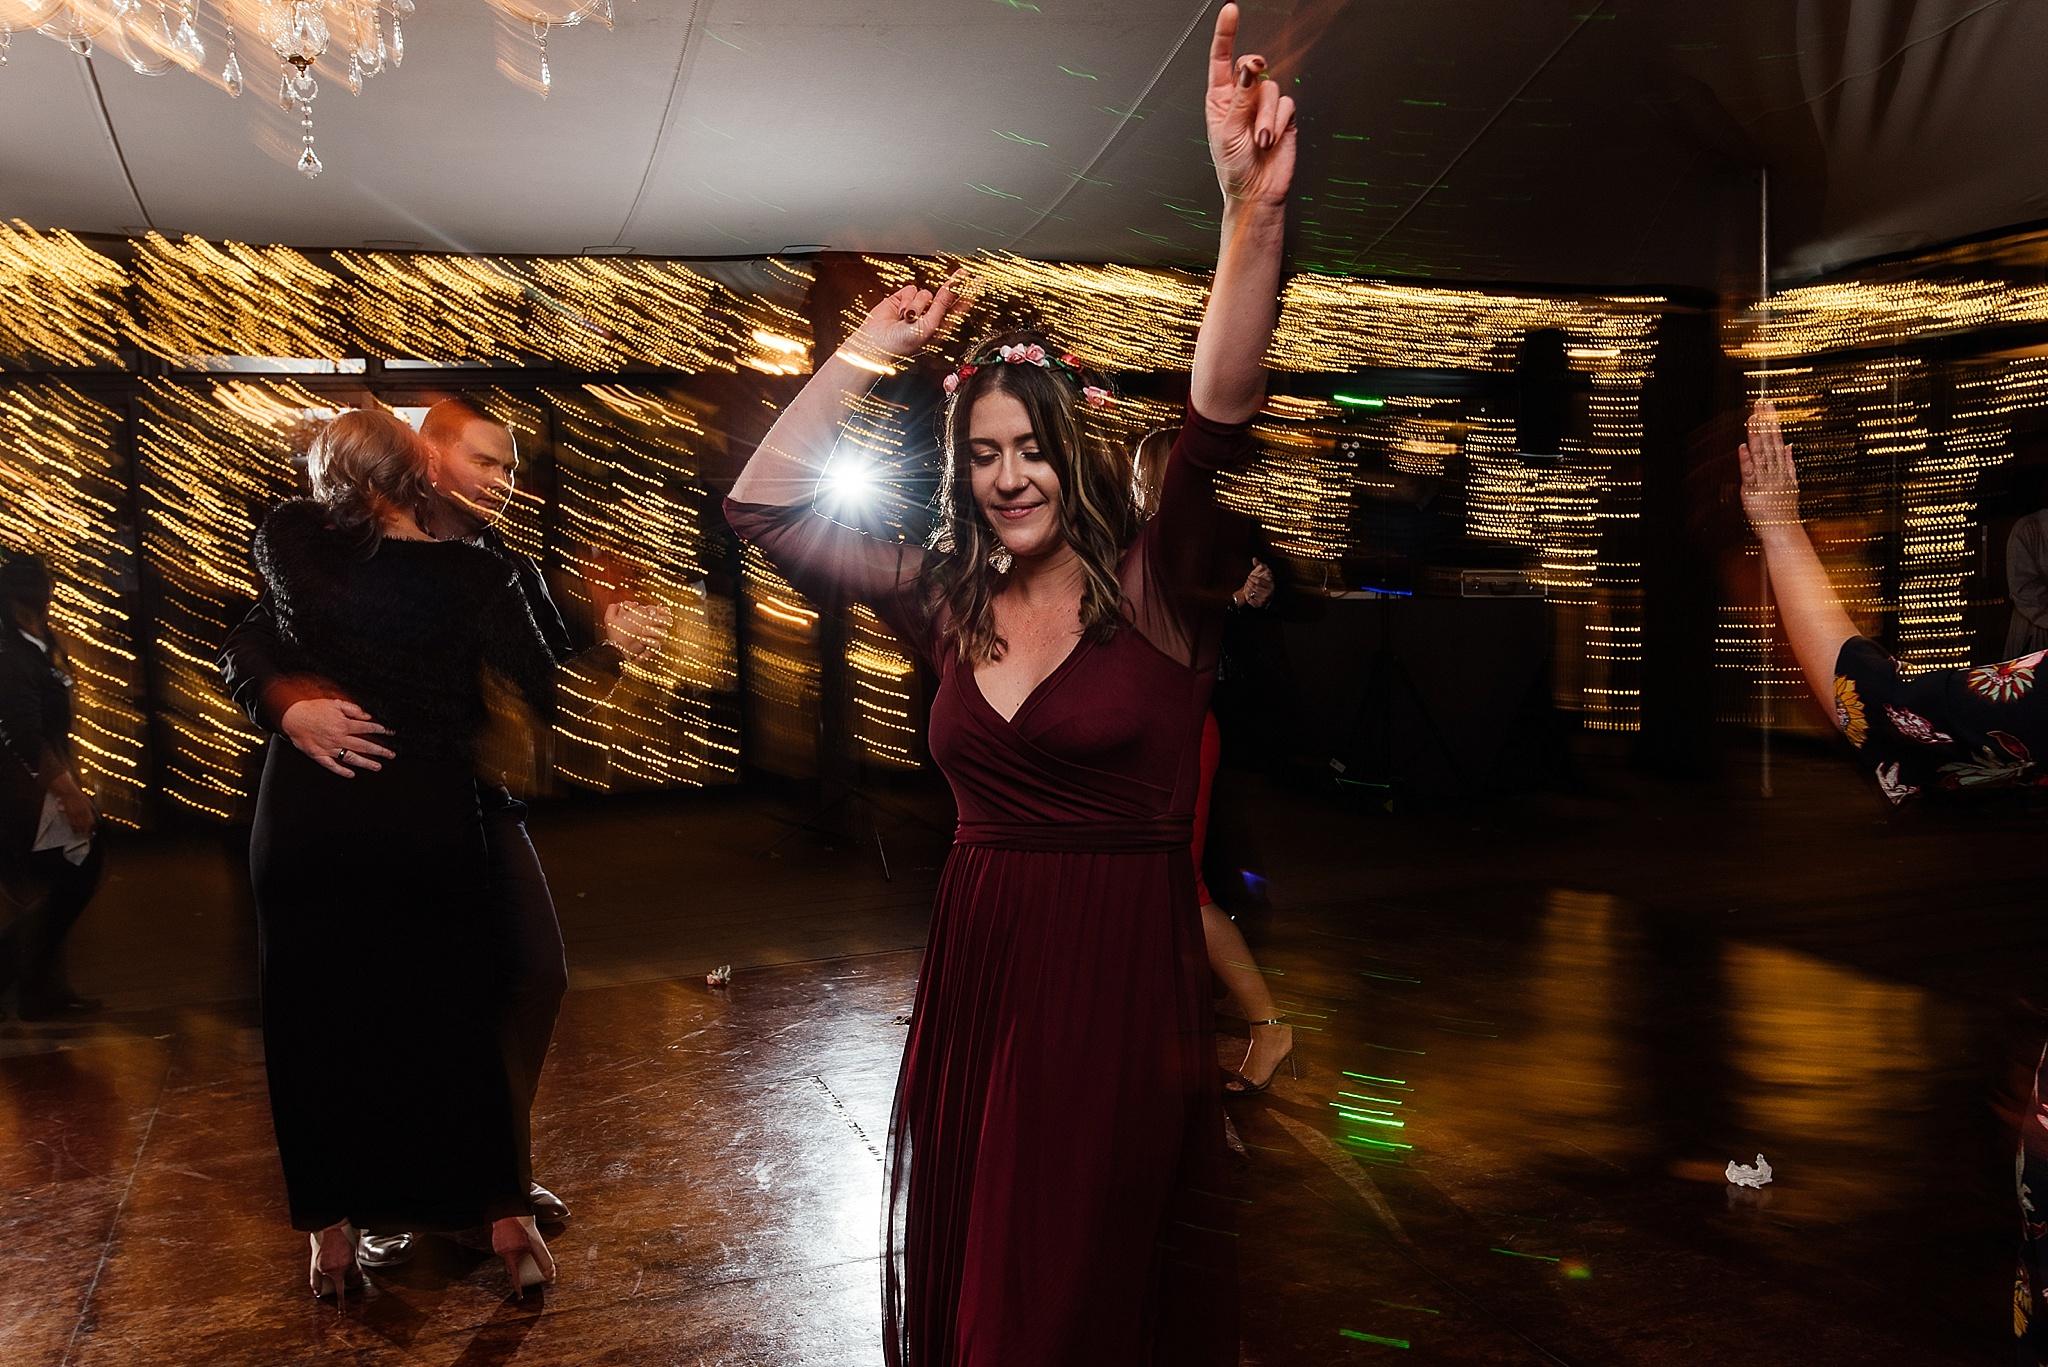 Cape Town Photographer Darren Bester - Die Woud Wedding - Gareth & Roxanne_0063.jpg